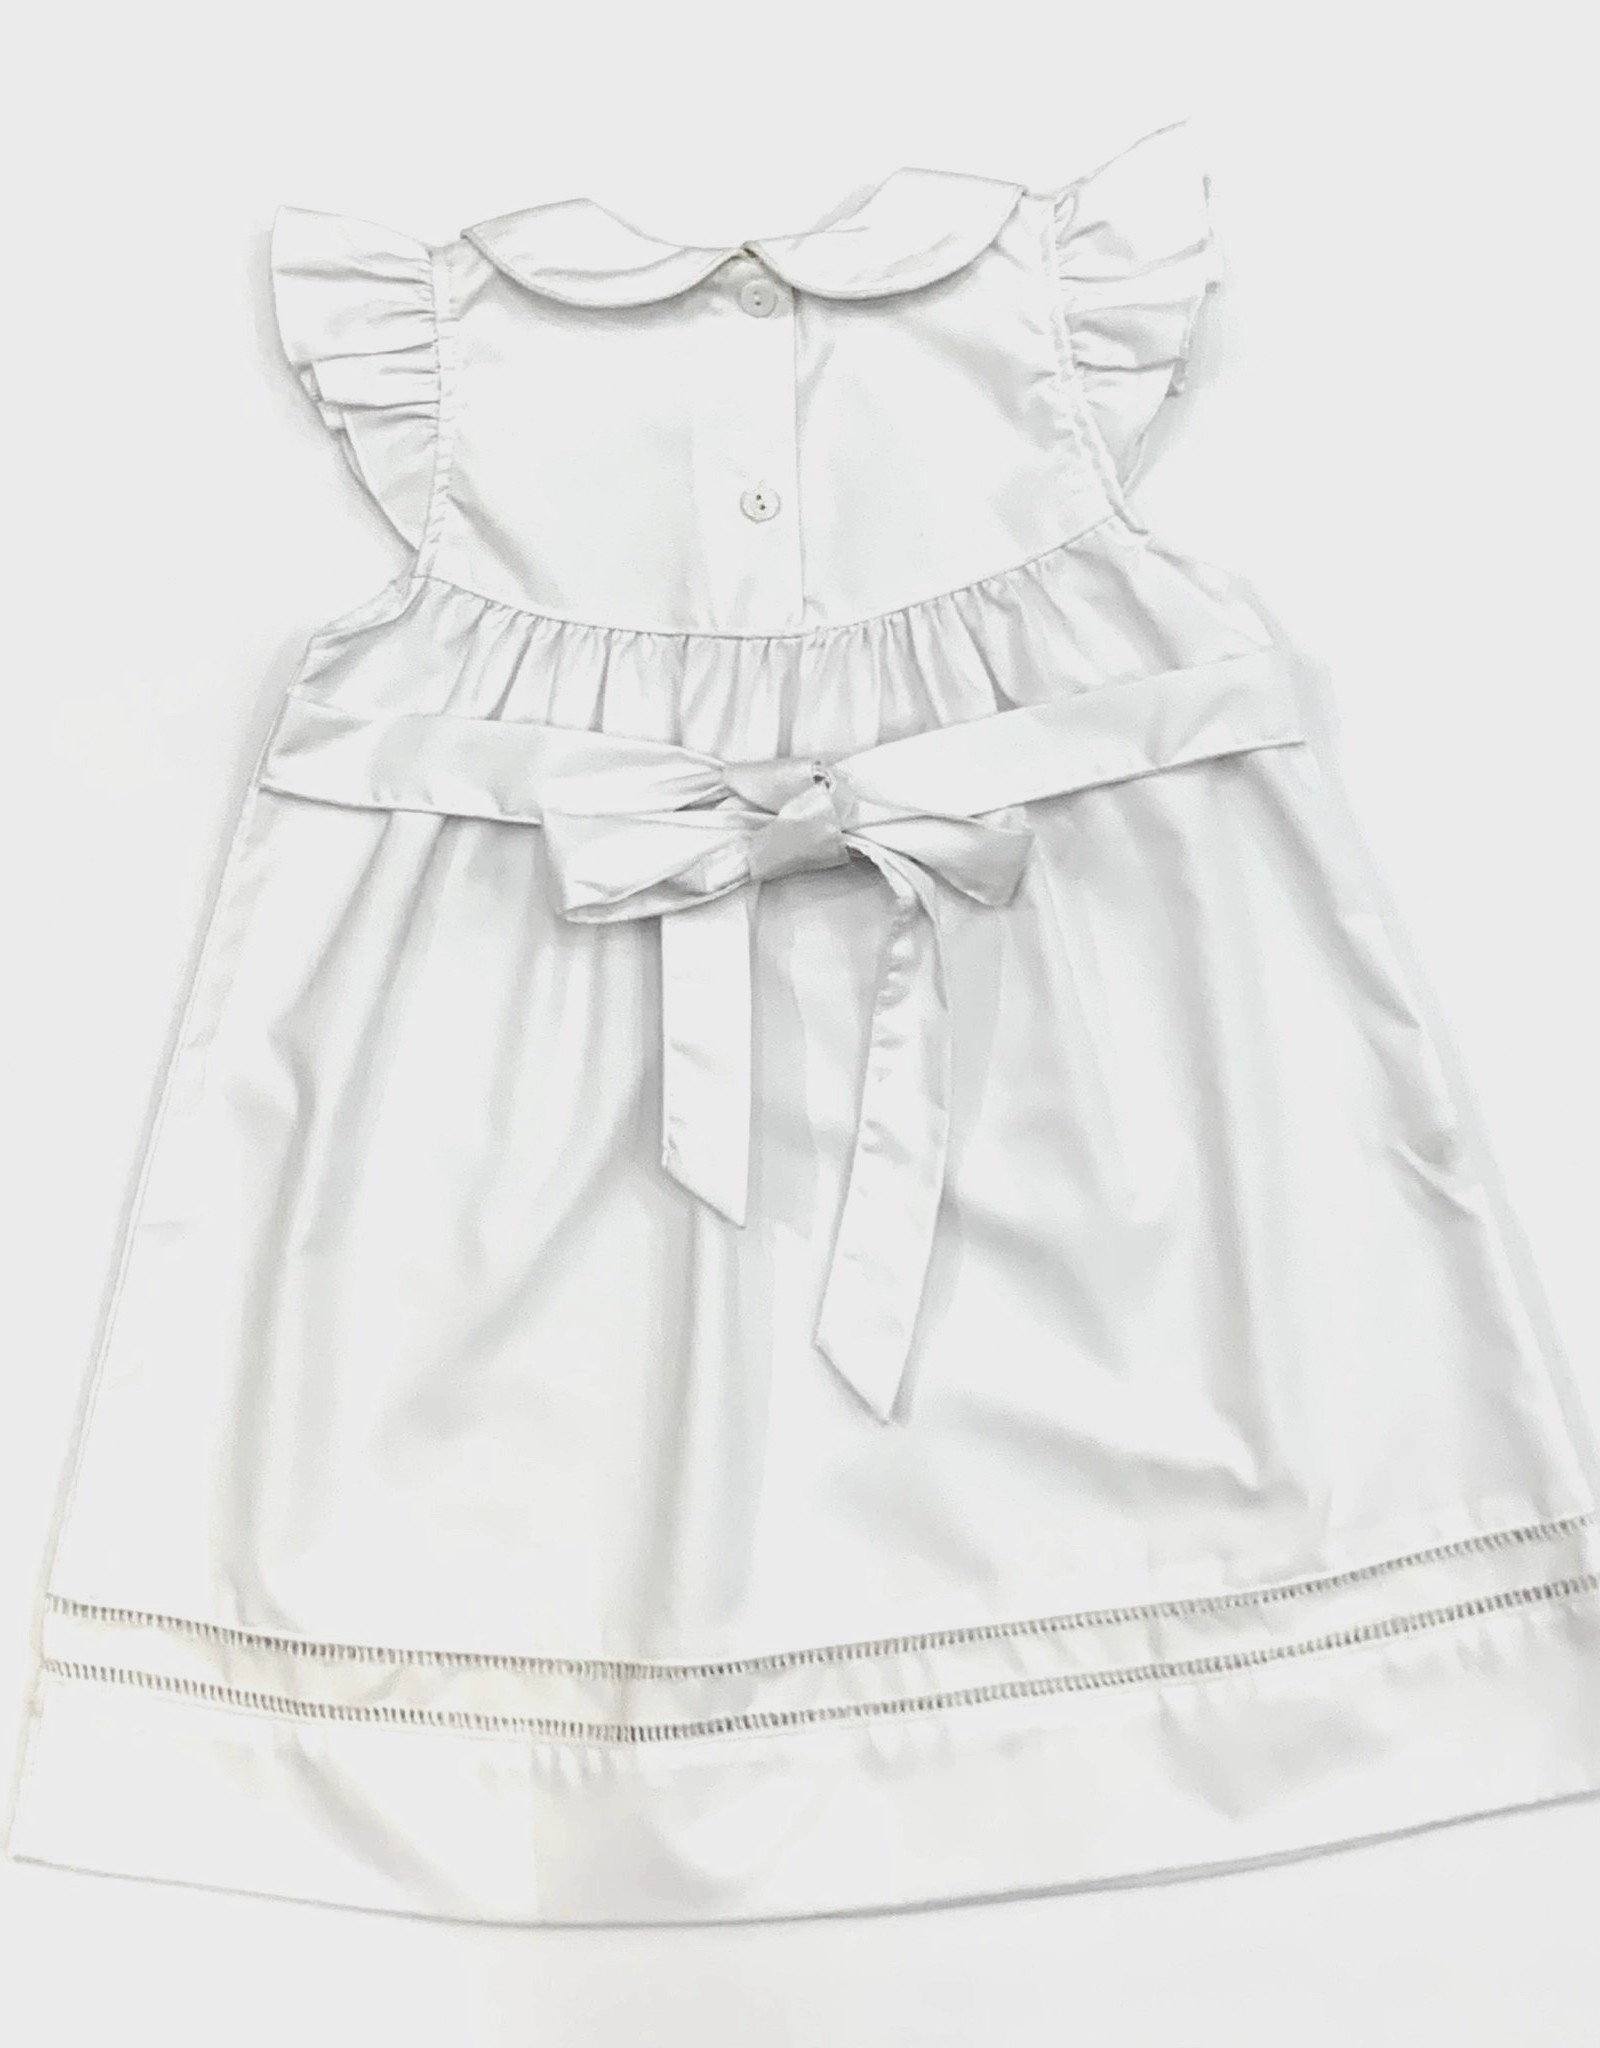 Sweet Dreams White hemstitch dress